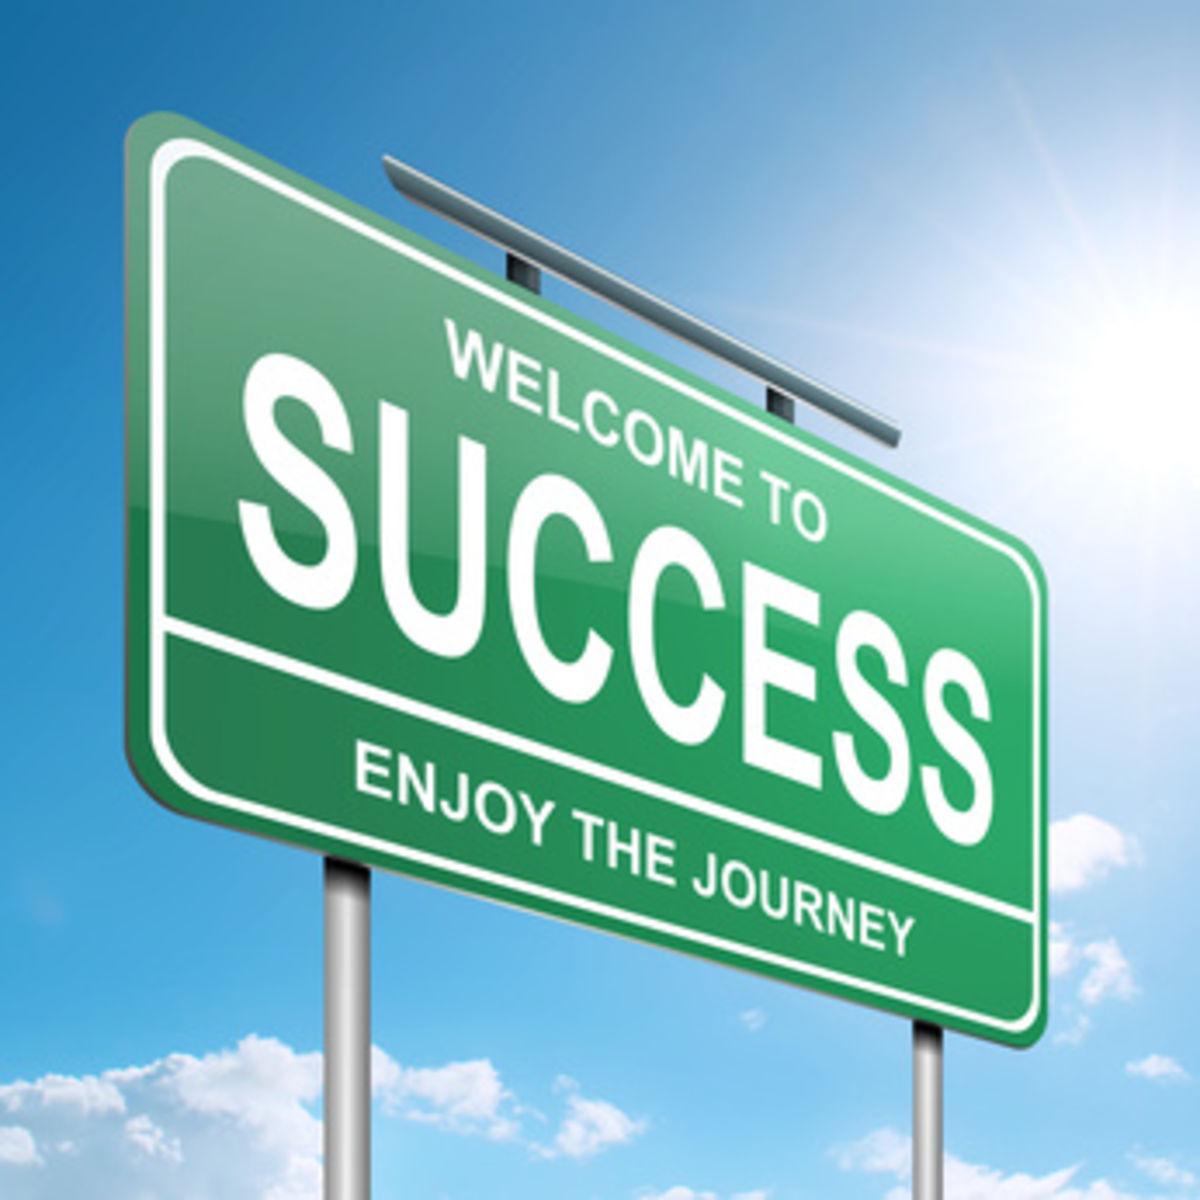 PunjabKesari,Success, Motivational Concept, Inspirational Concept, Success Formula, Punjab kesari, Dharam, Punjab Kesari Curiosity, Kundli Tv Curiosity